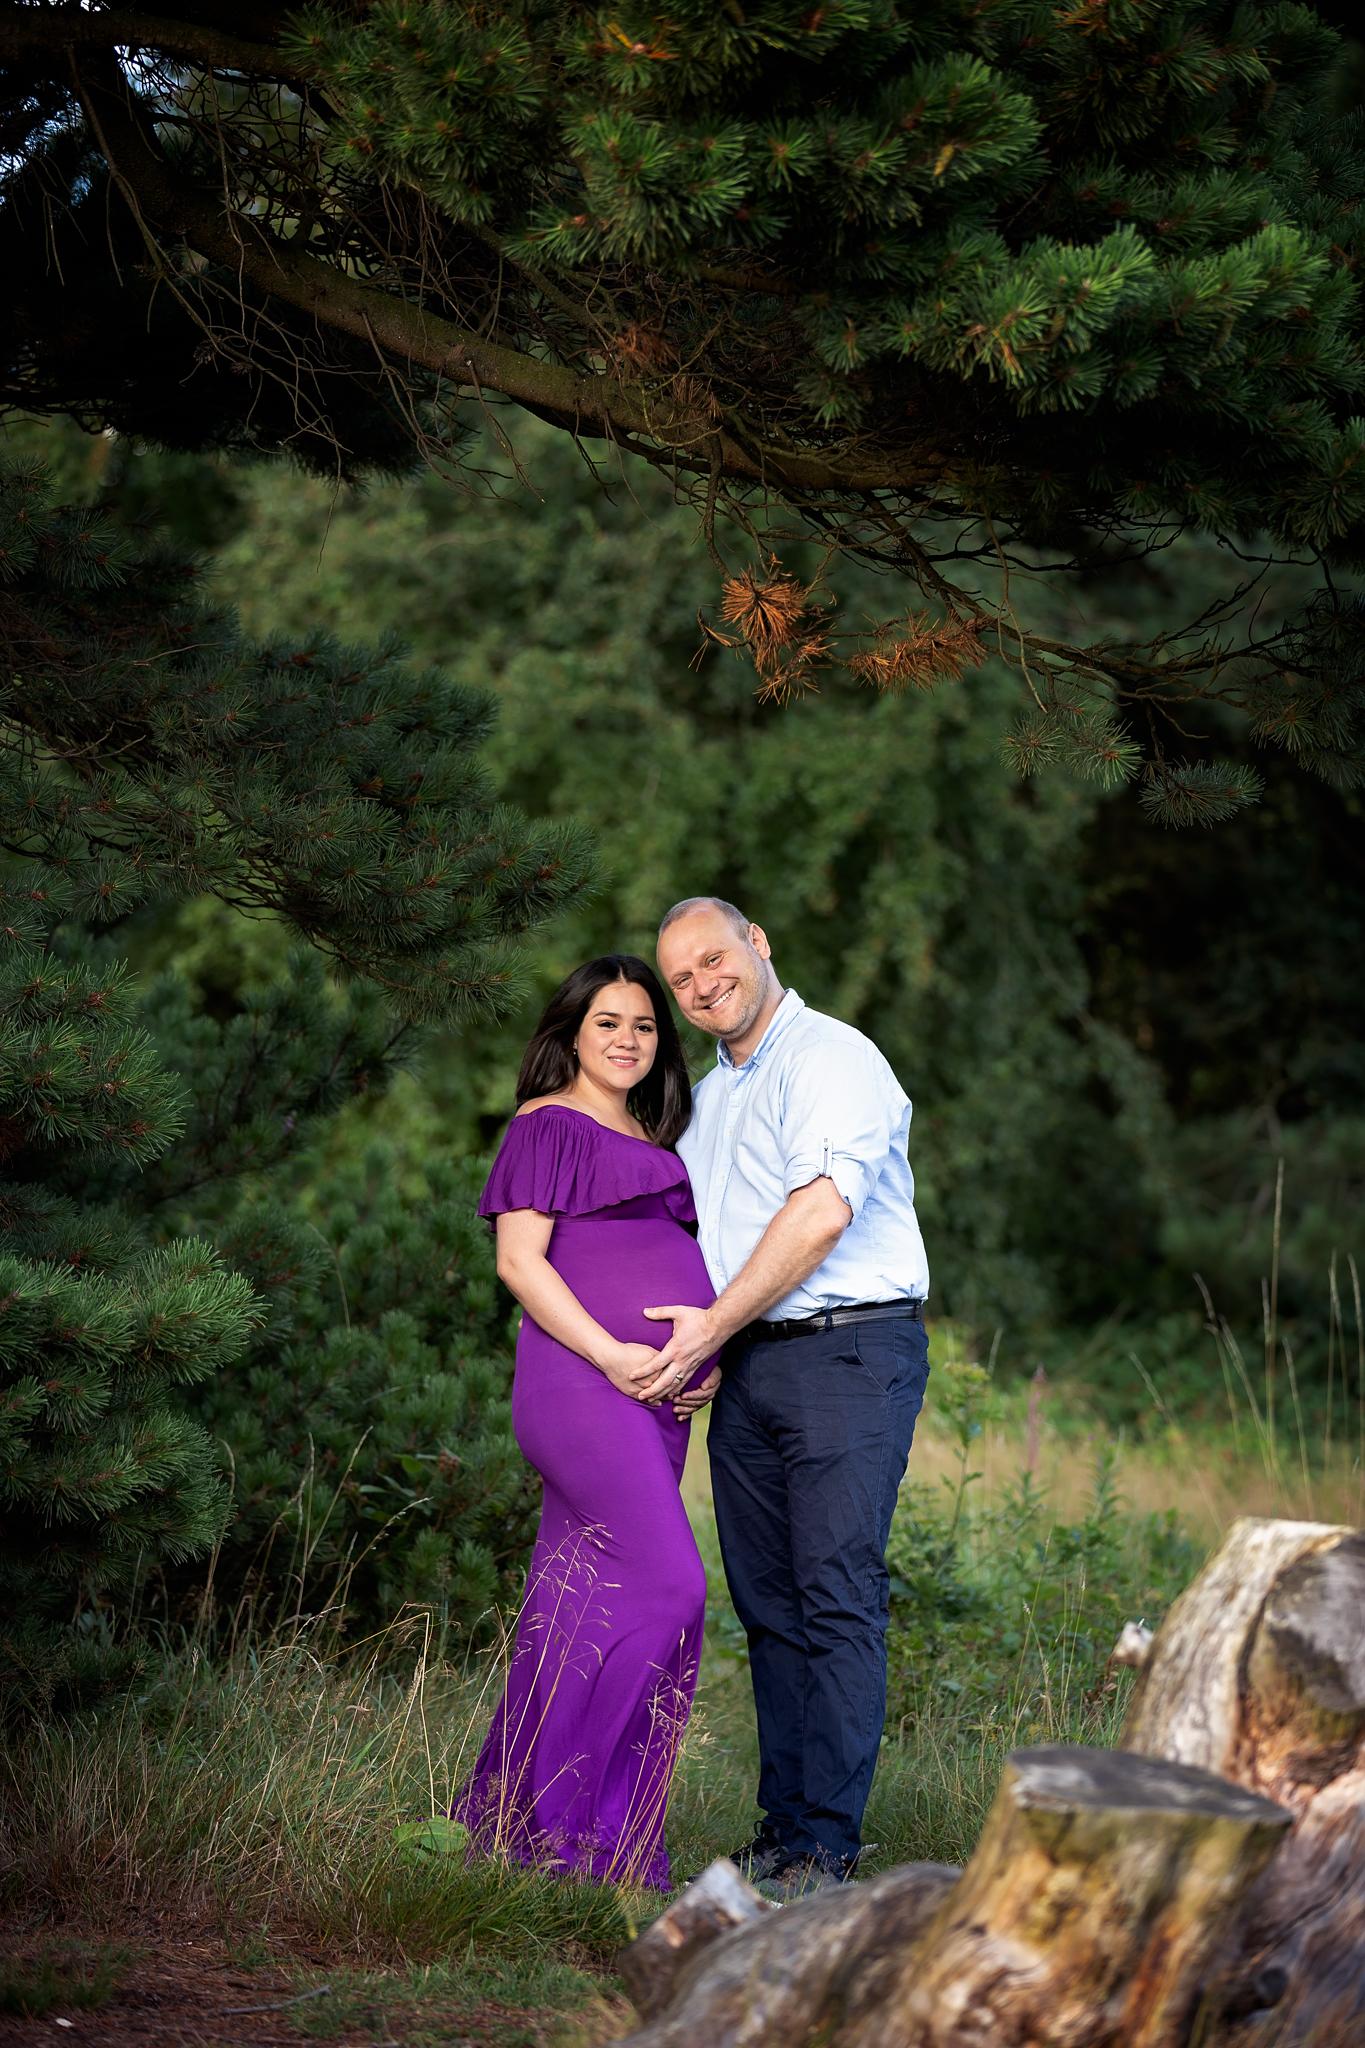 Couple maternity photoshoot in Leeds, West Yorkshire